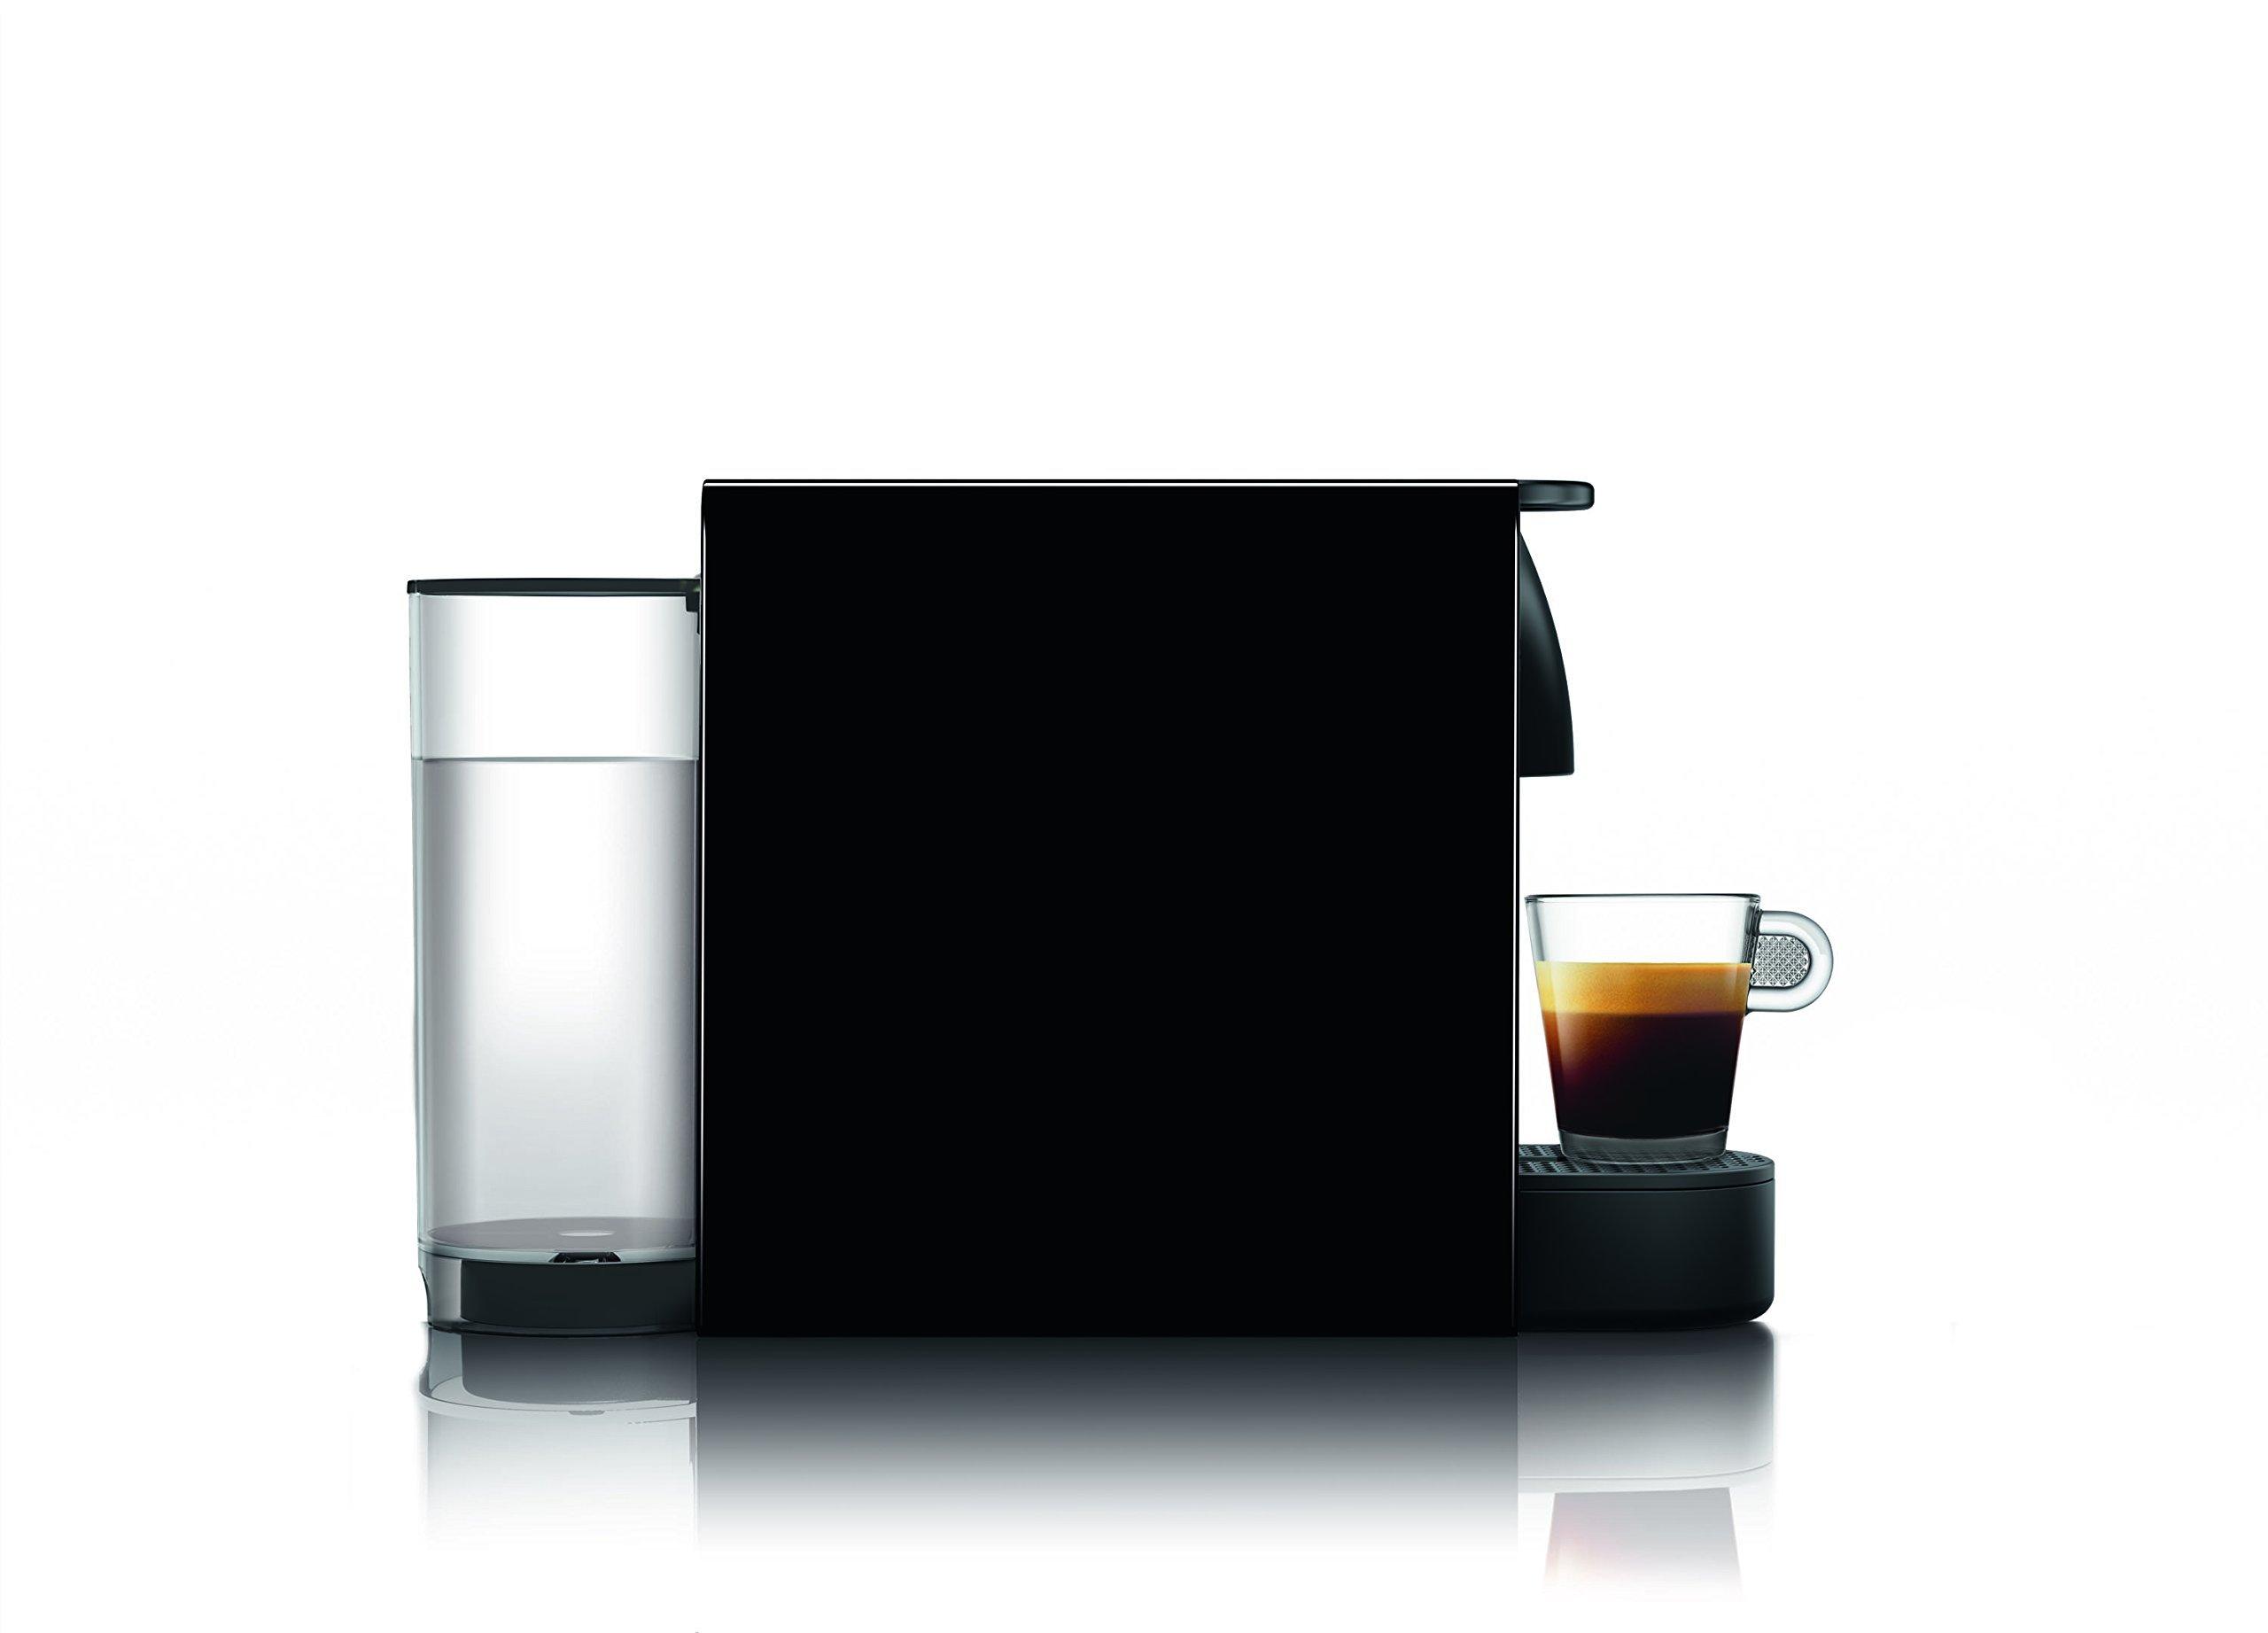 Nespresso Essenza Mini Original Espresso Machine Bundle with Aeroccino Milk Frother by Breville, Piano Black (Renewed) by Breville (Image #5)